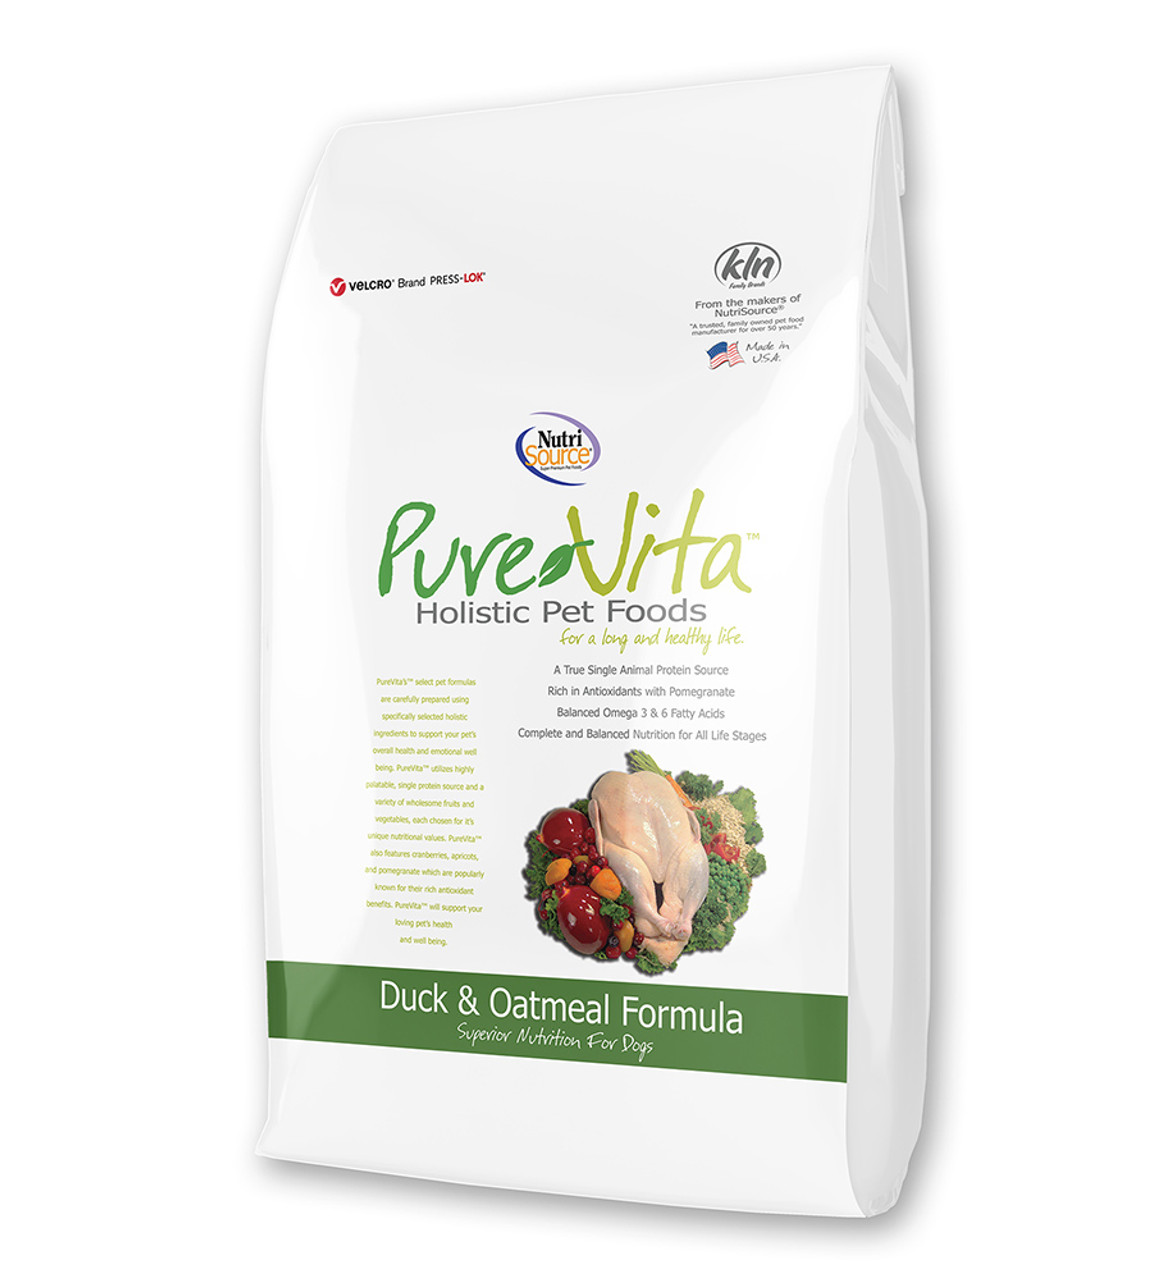 PureVita Duck & Oatmeal Dry Dog Food